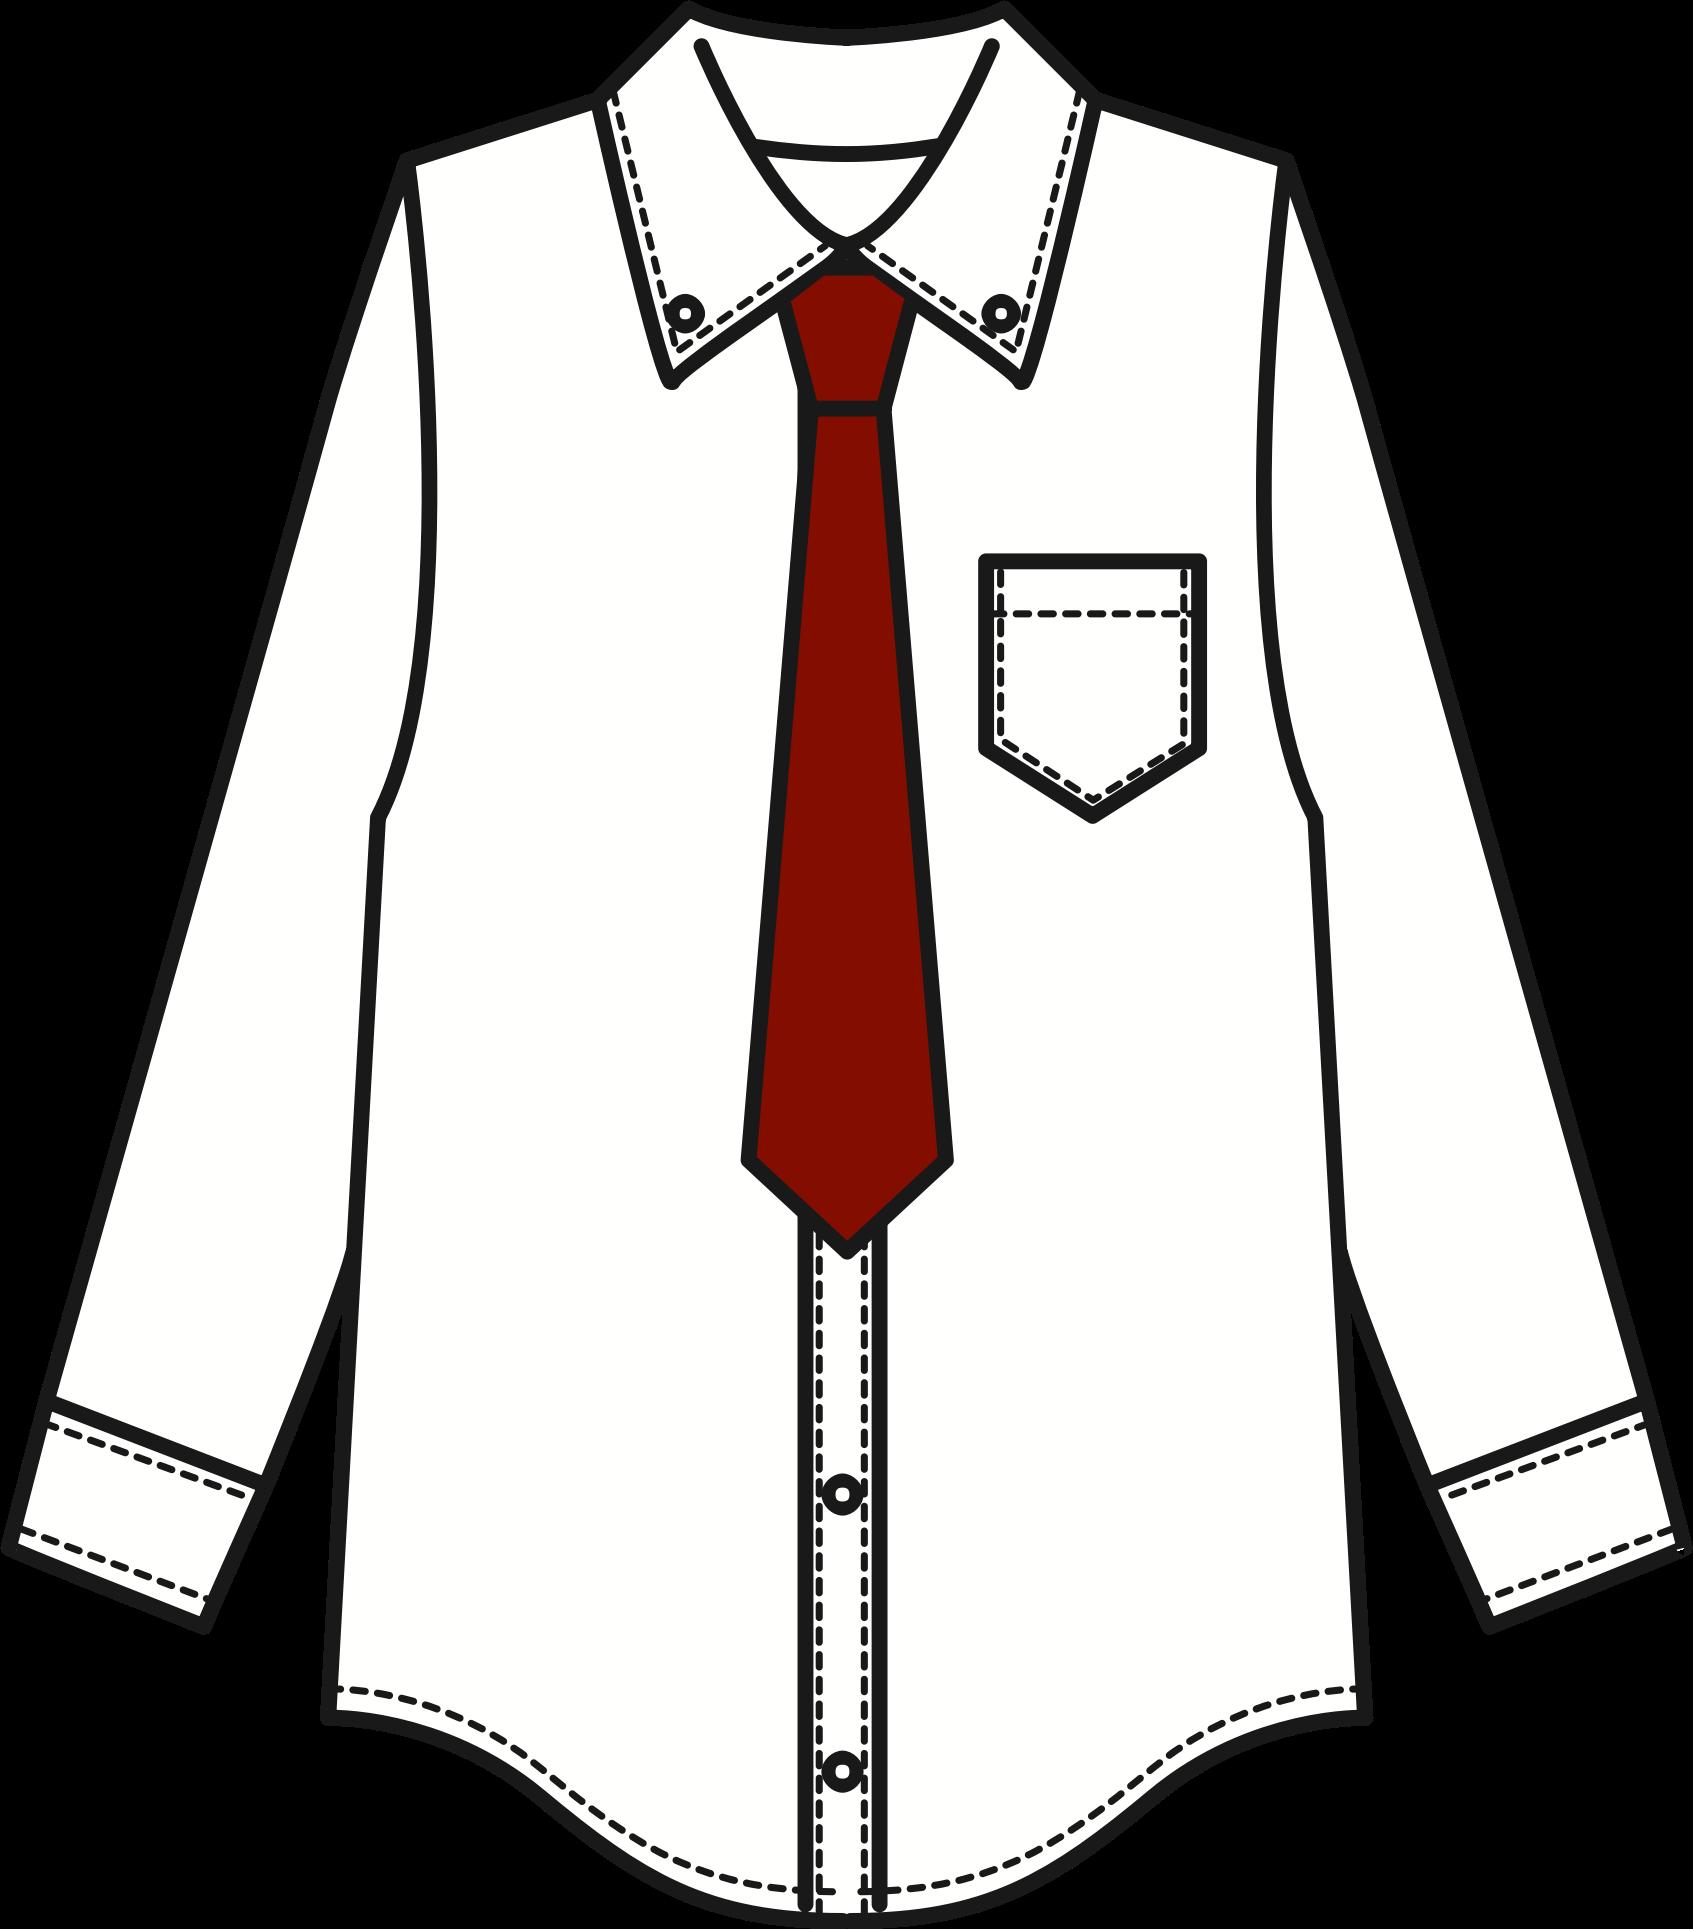 Clipart shirt uniform. White and tie big